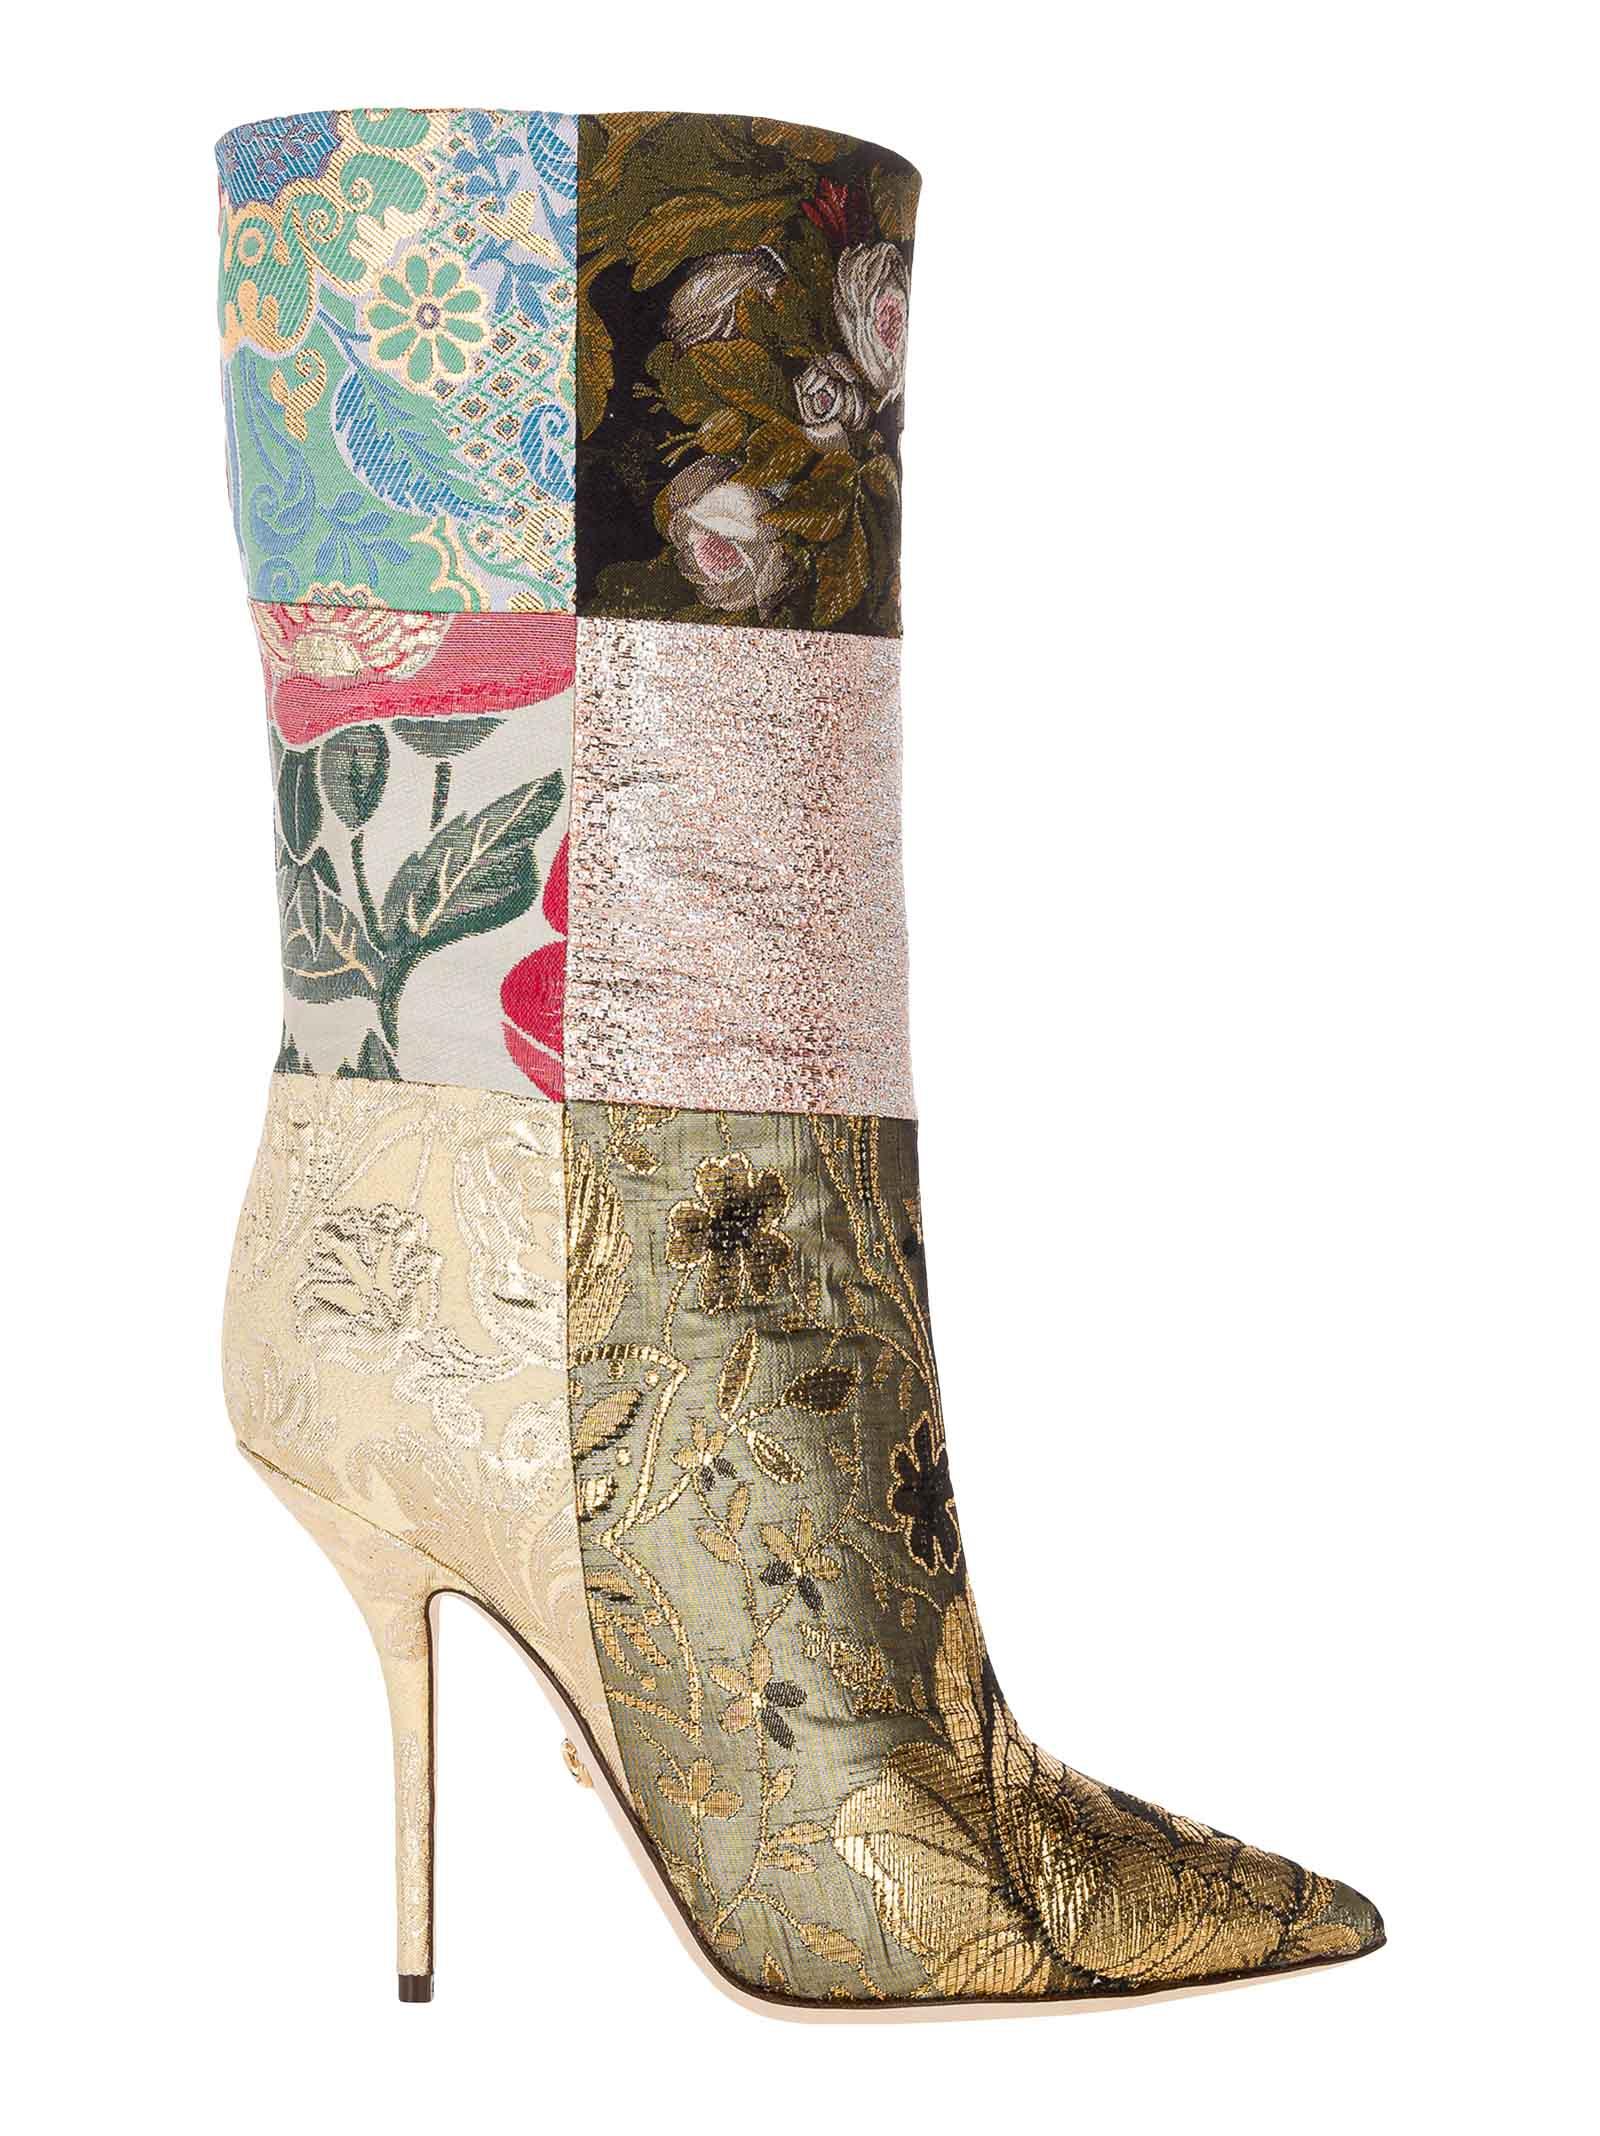 Dolce & Gabbana Dolce & gabbana Patchwork Fabric Ankle Boots